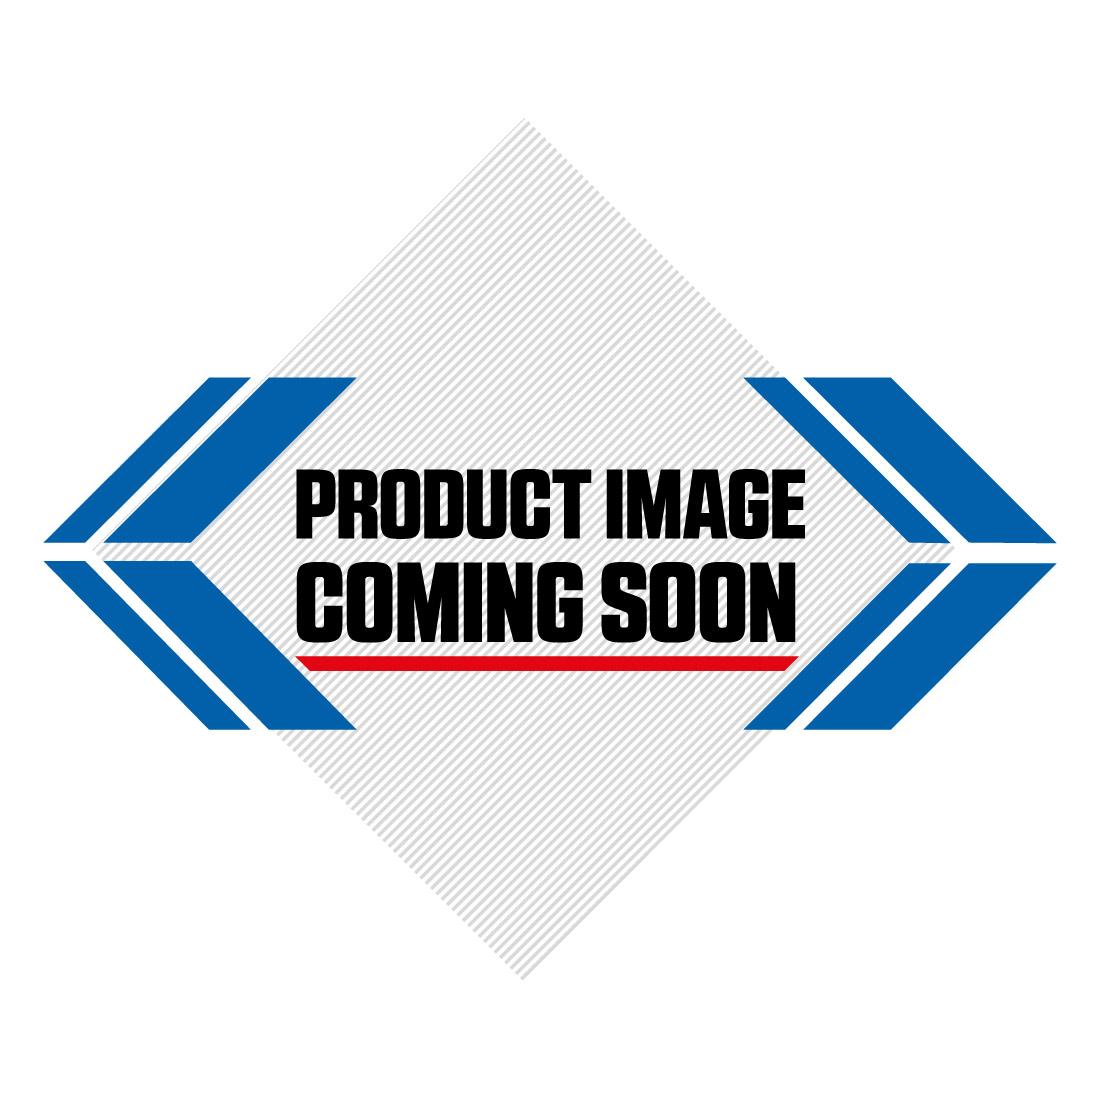 Renthal Twinring Rear Sprocket Kawasaki KX KXF KDX KLX Suzuki RMZ - Green Image-5>